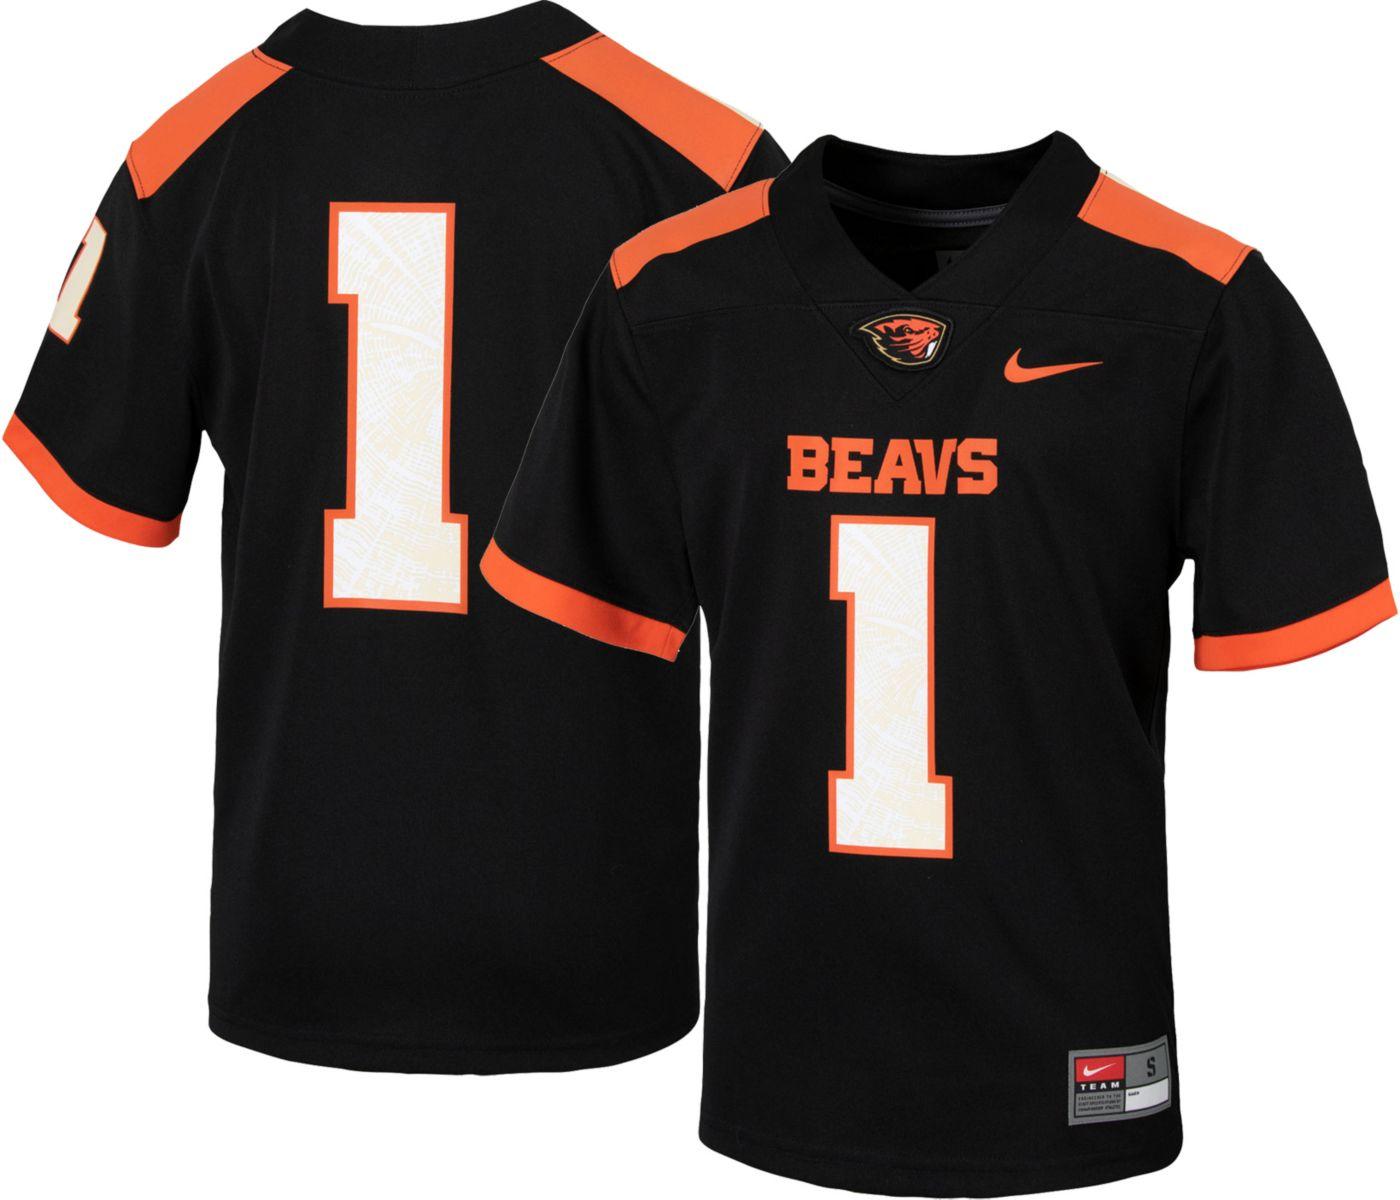 Nike Youth Oregon State Beavers #1 Replica Football Black Jersey